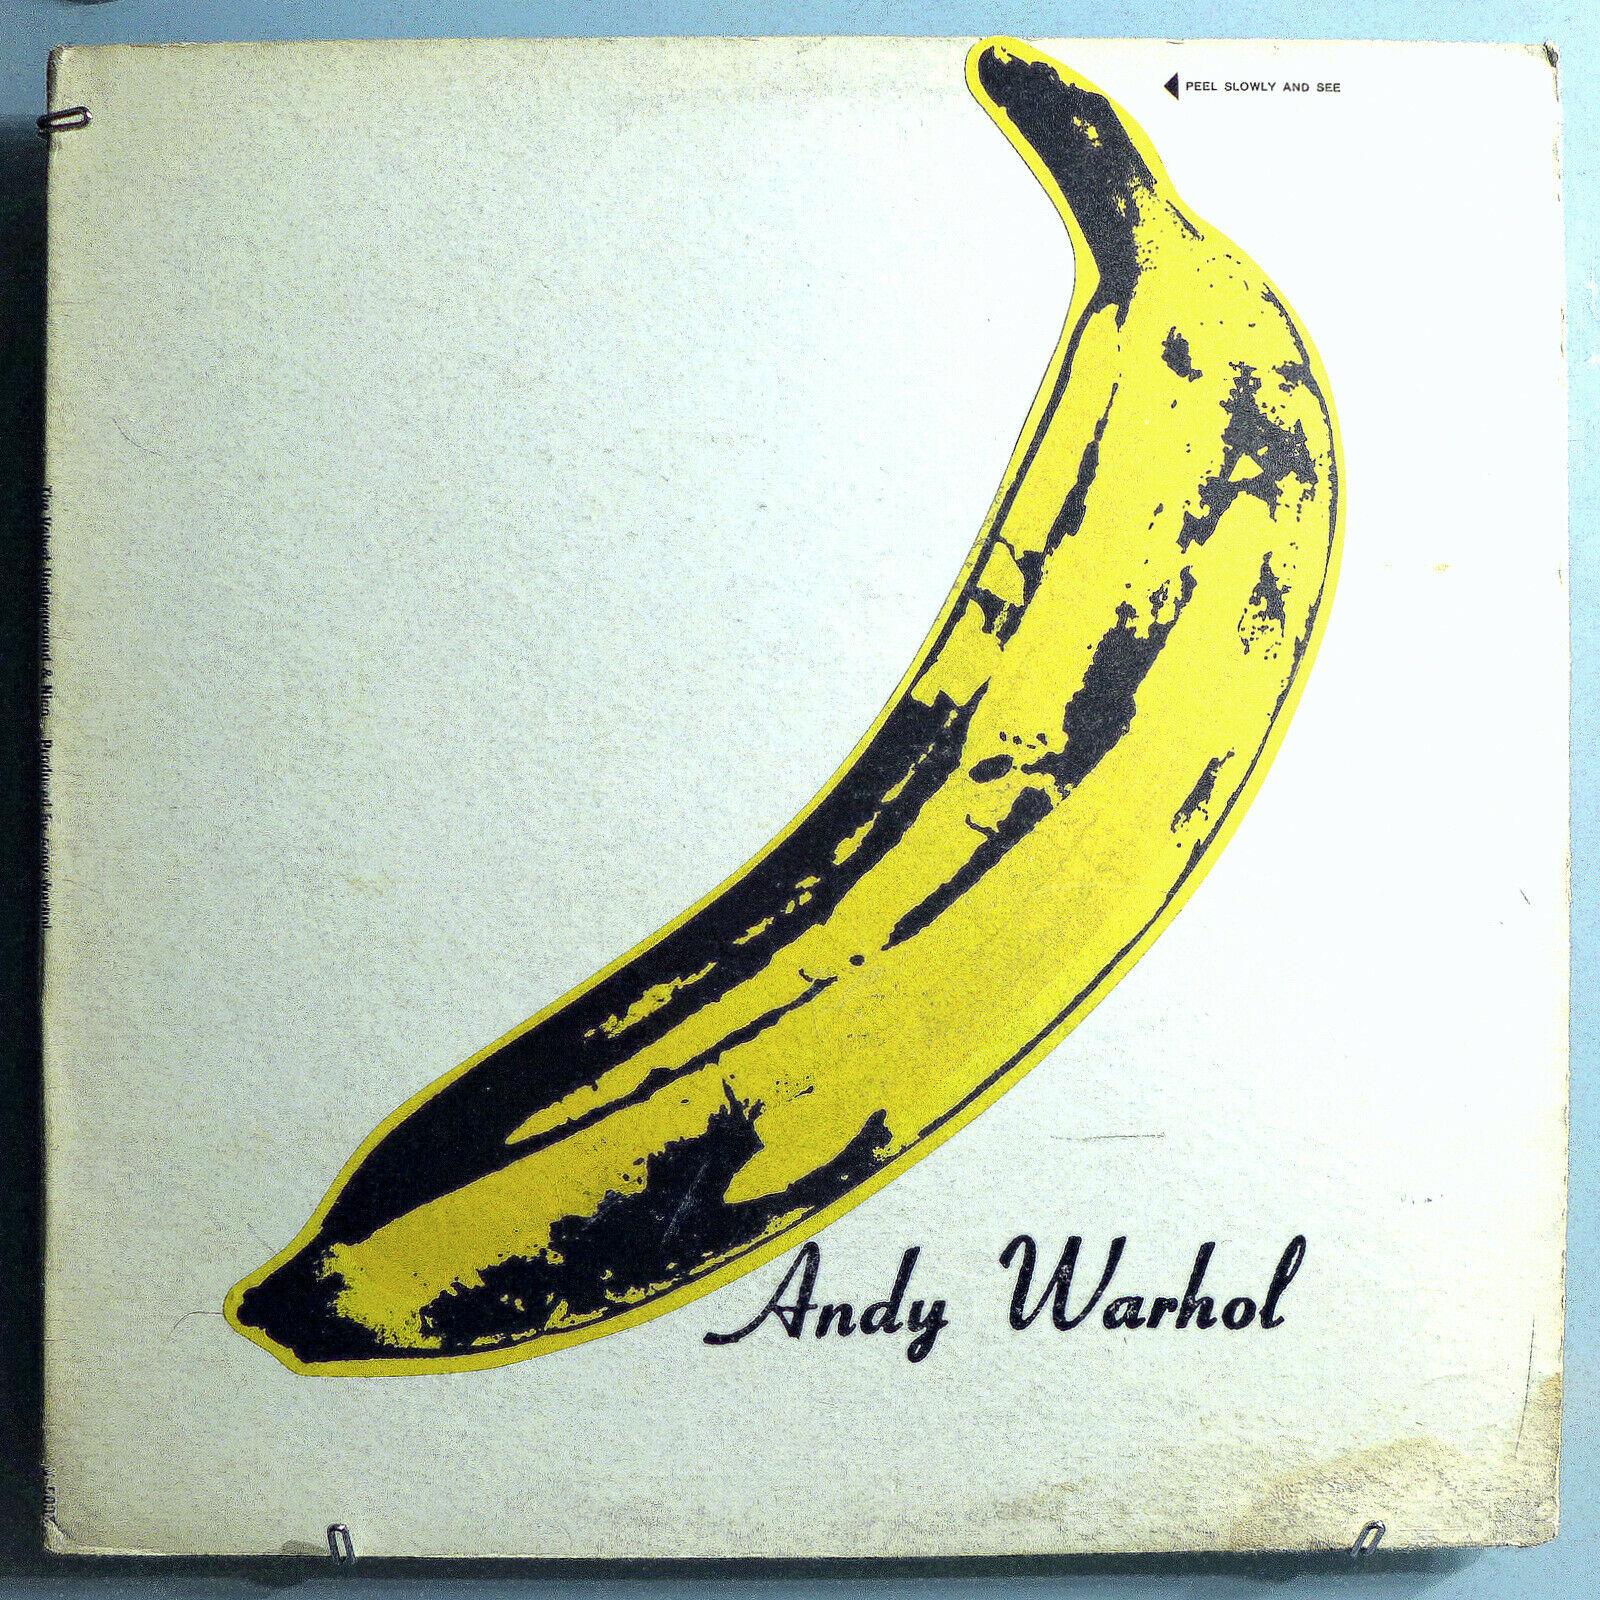 VELVET UNDERGROUND   NICO ANDY WARHOL BANANA RARE ORIG  67 MONO LP w TORSO COVER